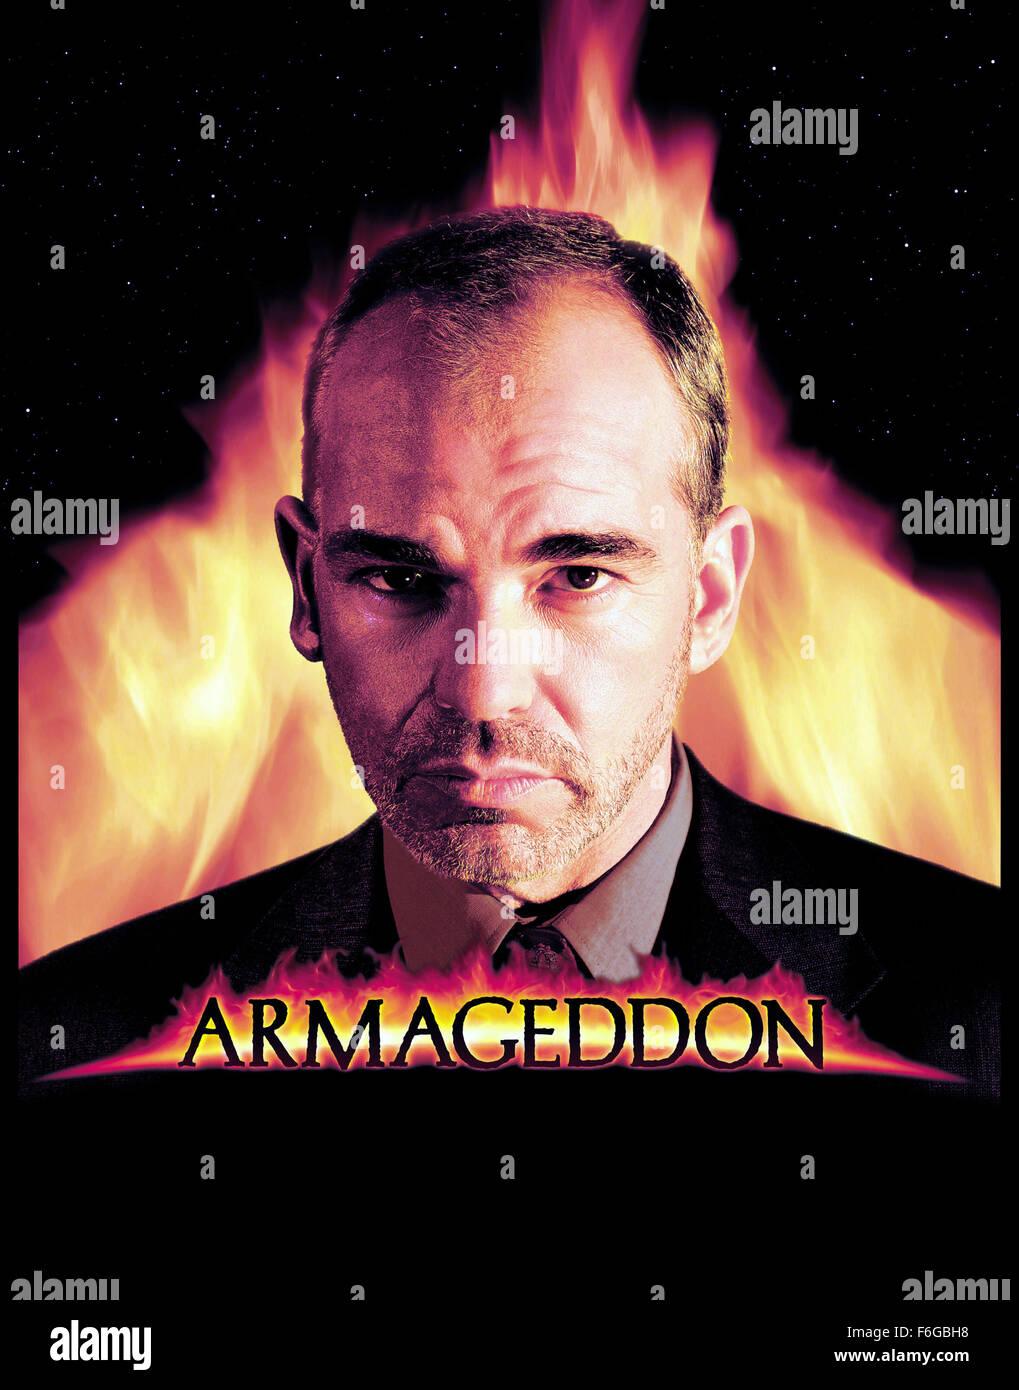 armageddon film poster 1998 stock photos armageddon film poster